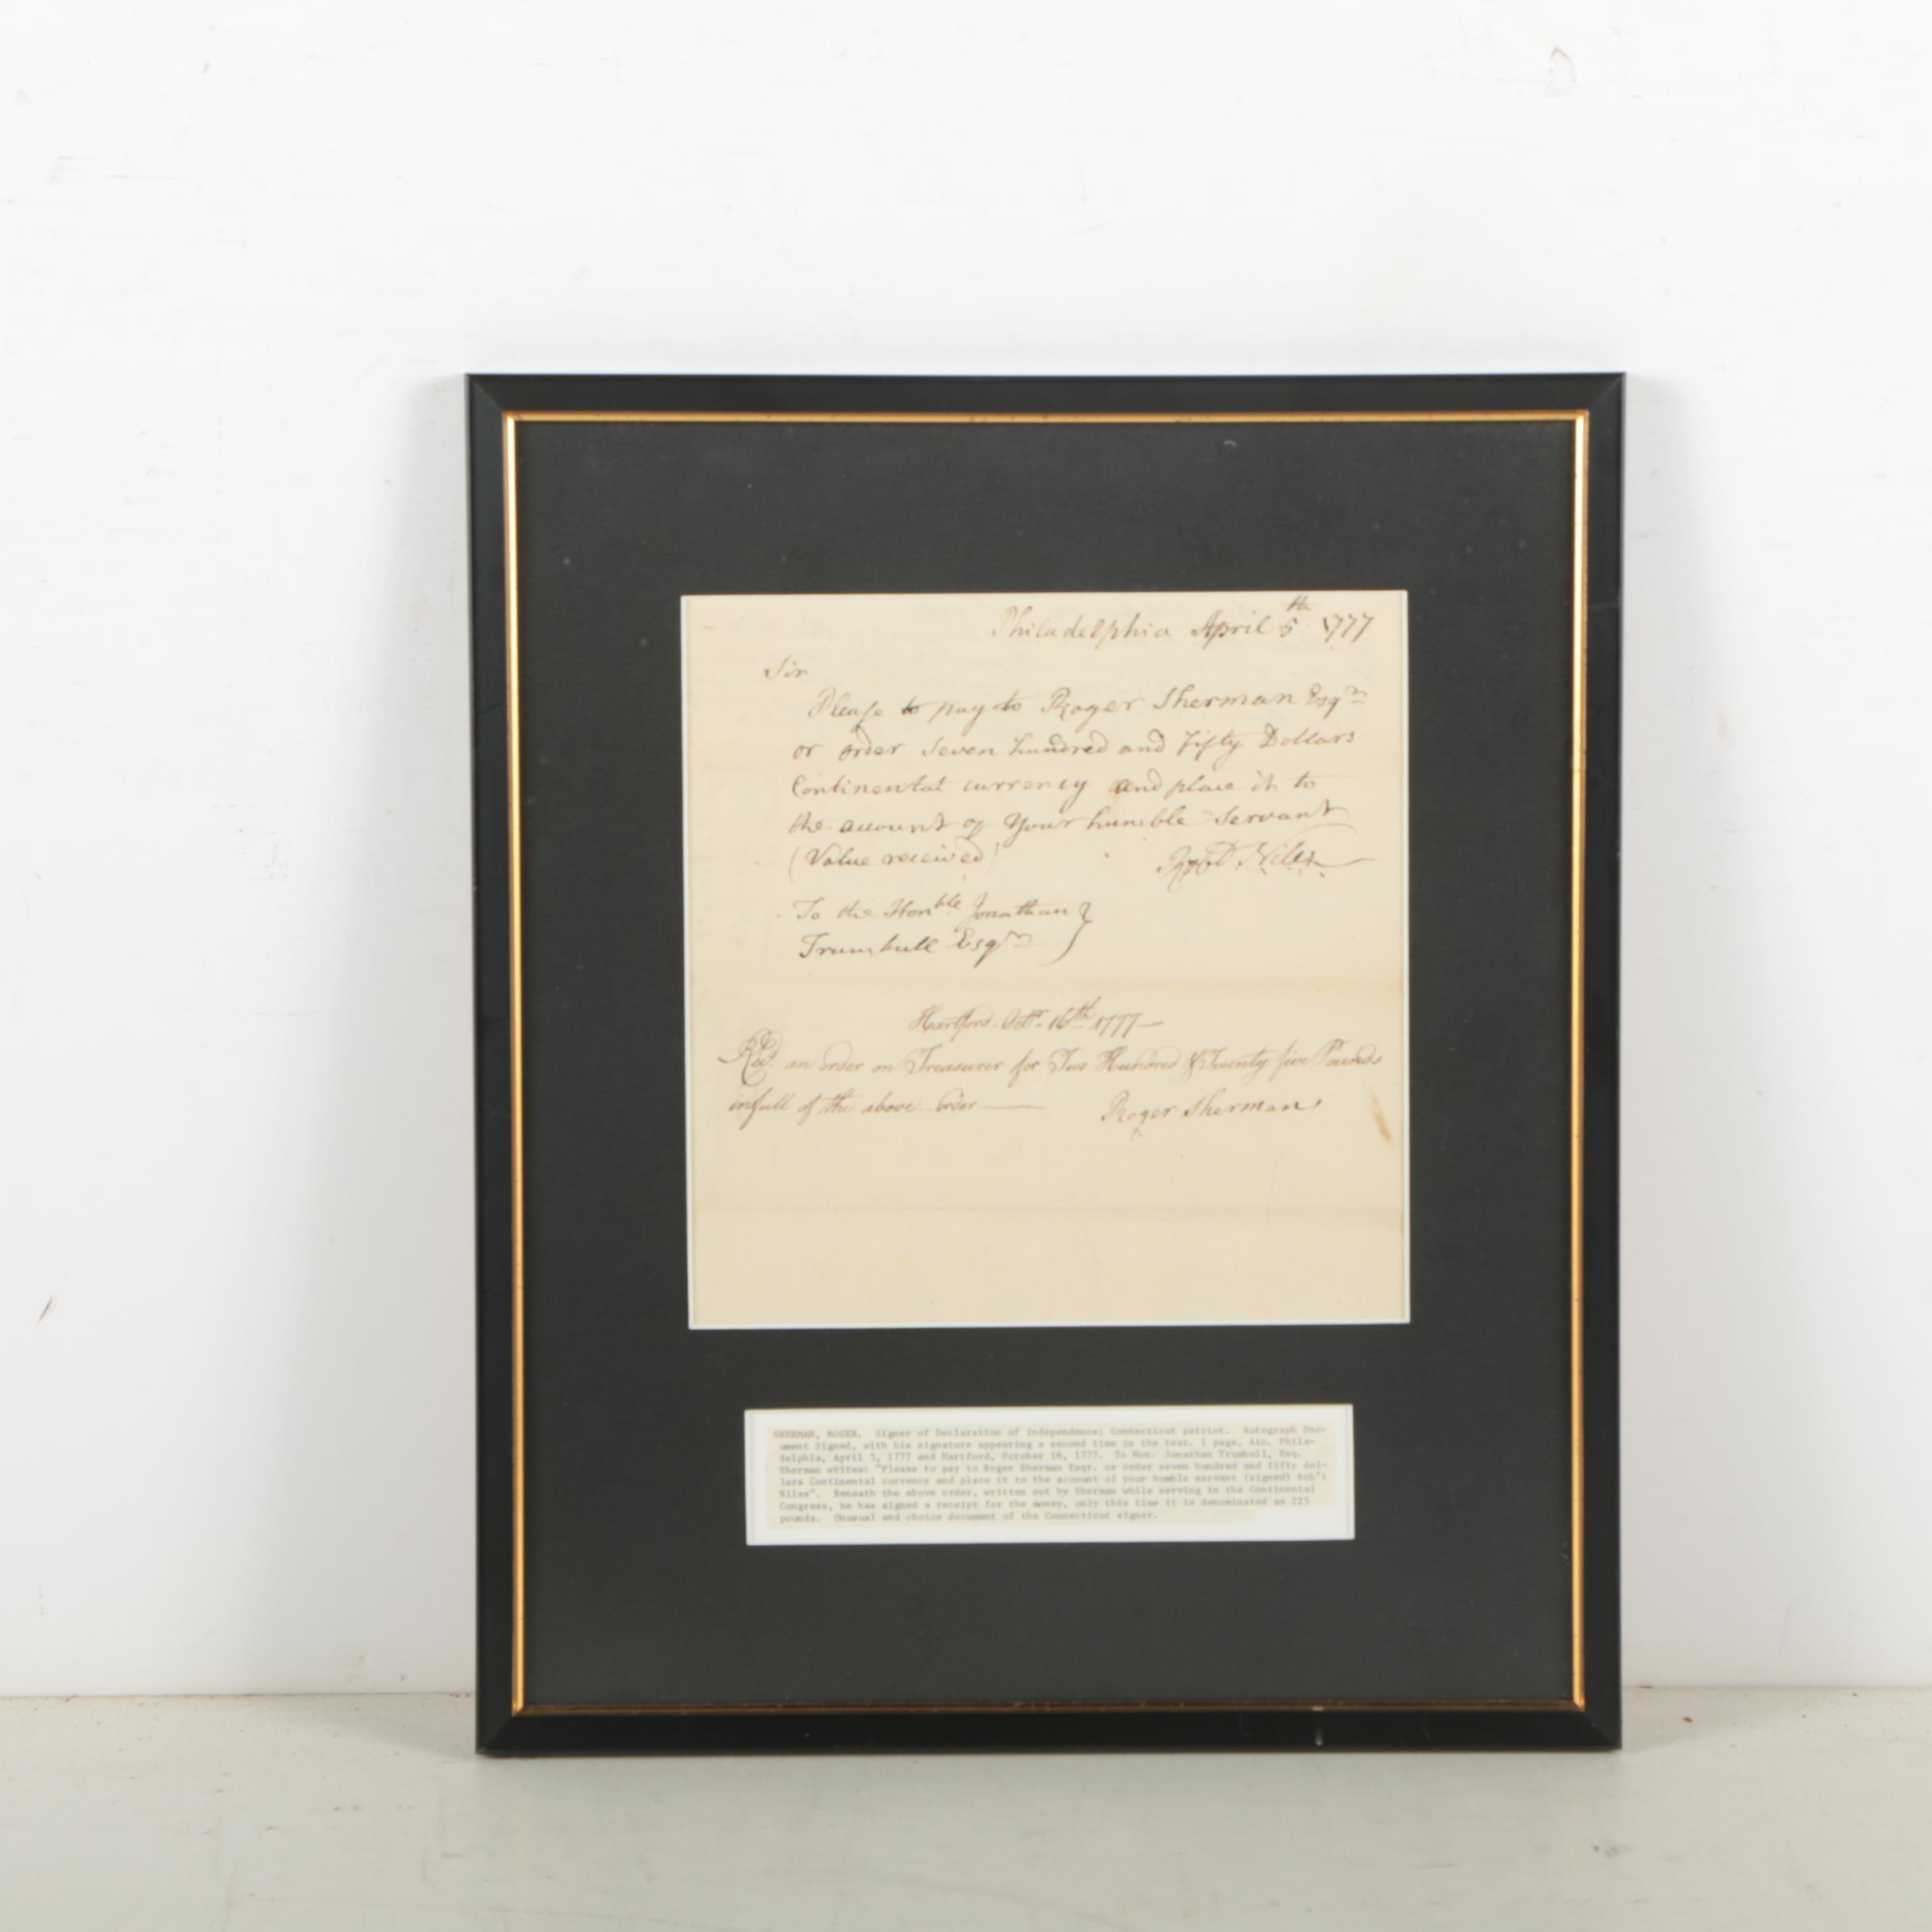 Roger Sherman Document Signed 1777